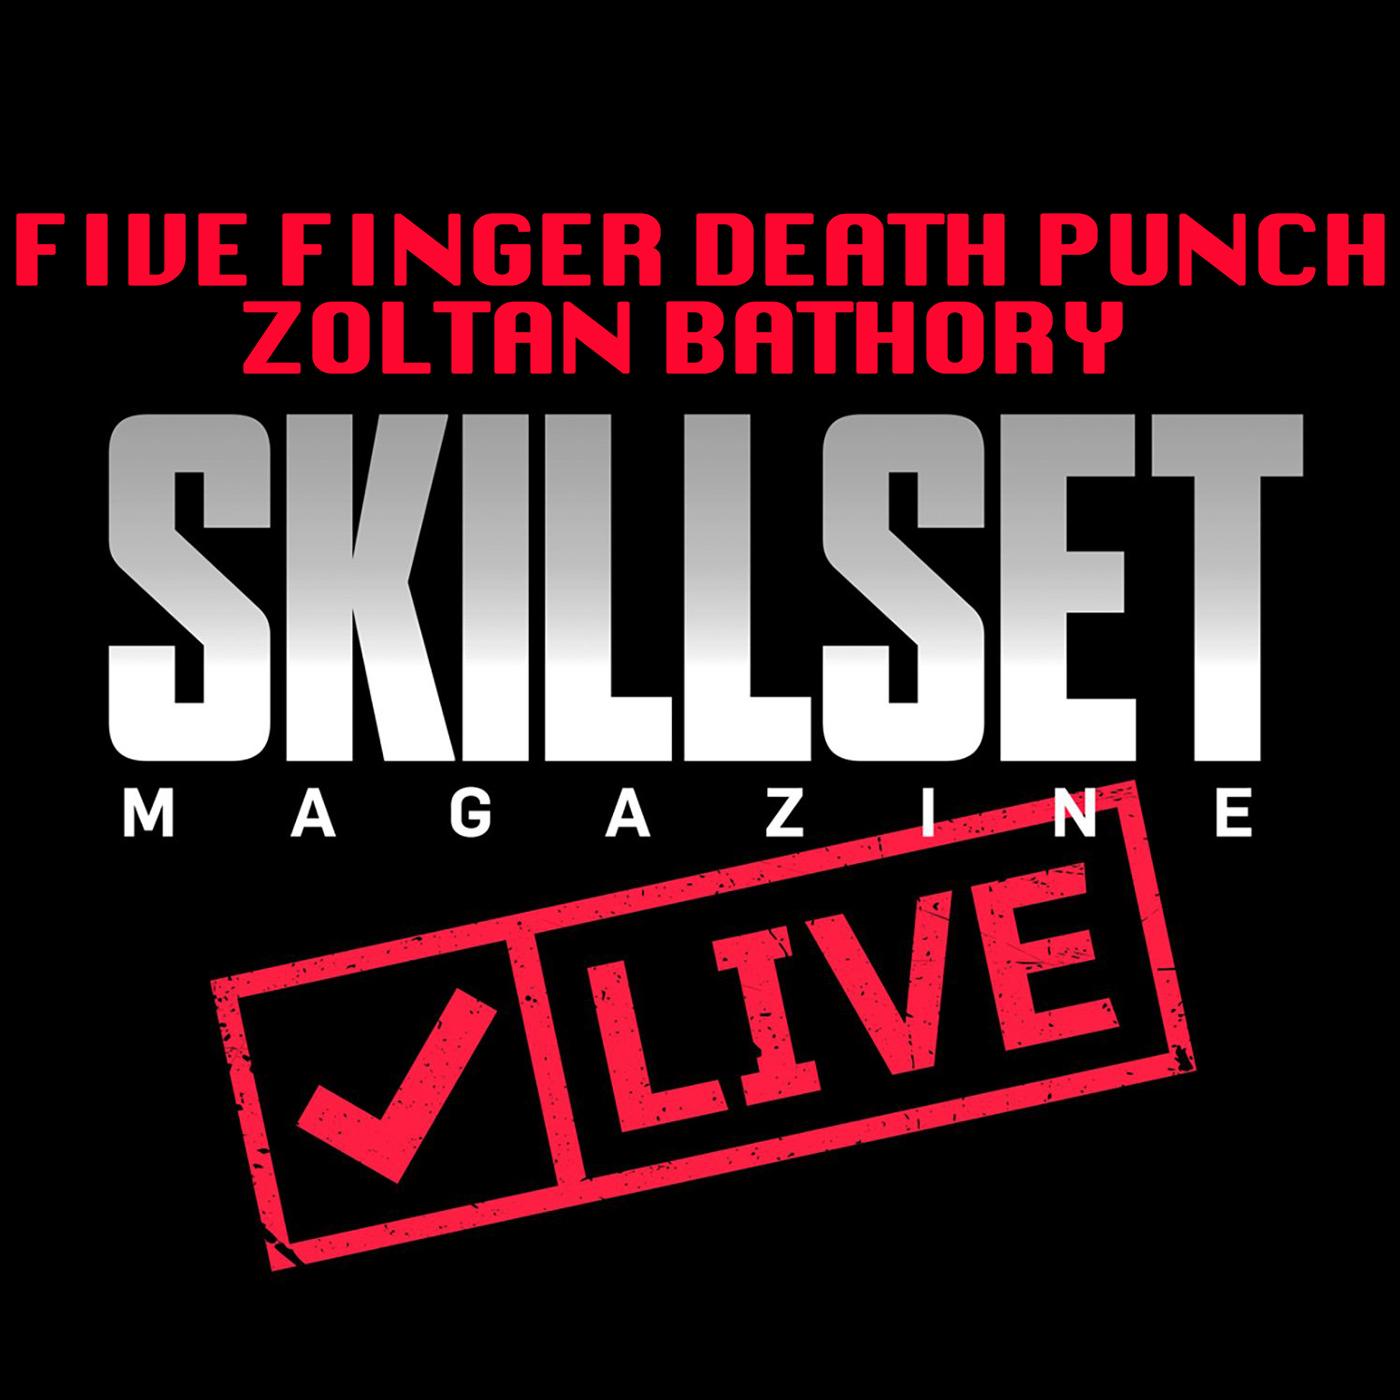 Skillset_Live27